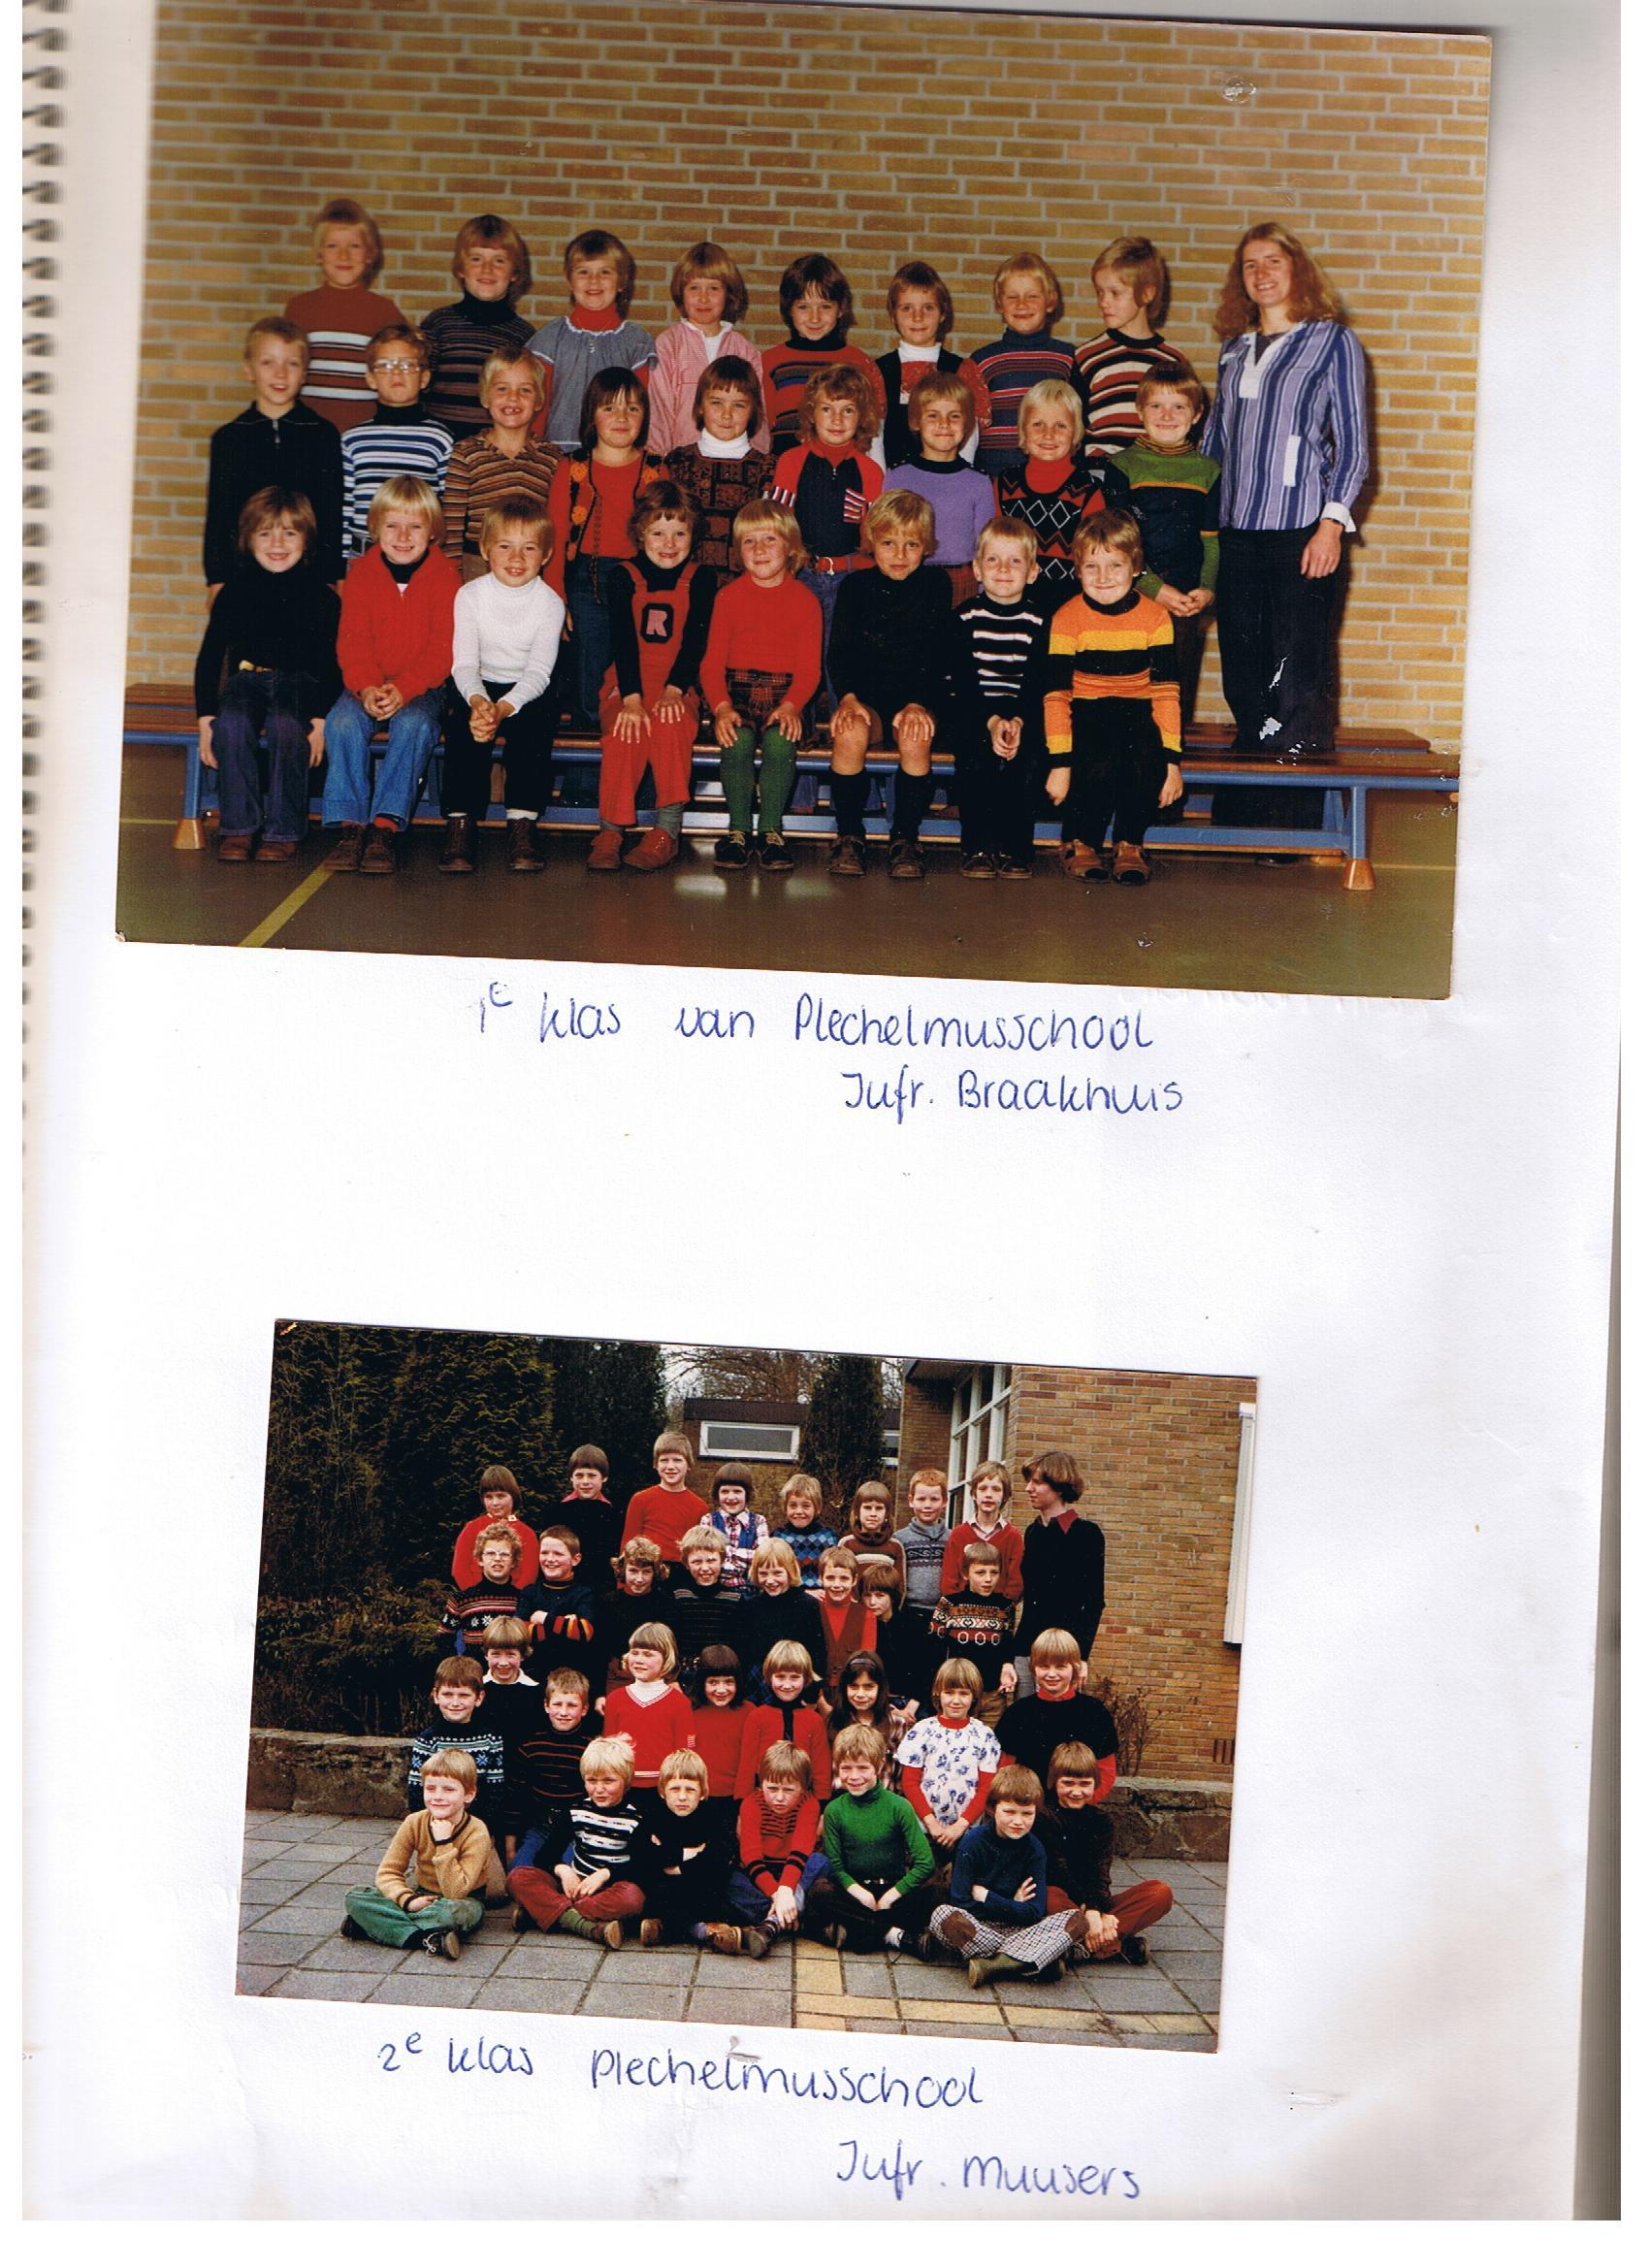 Plechelmus-School foto